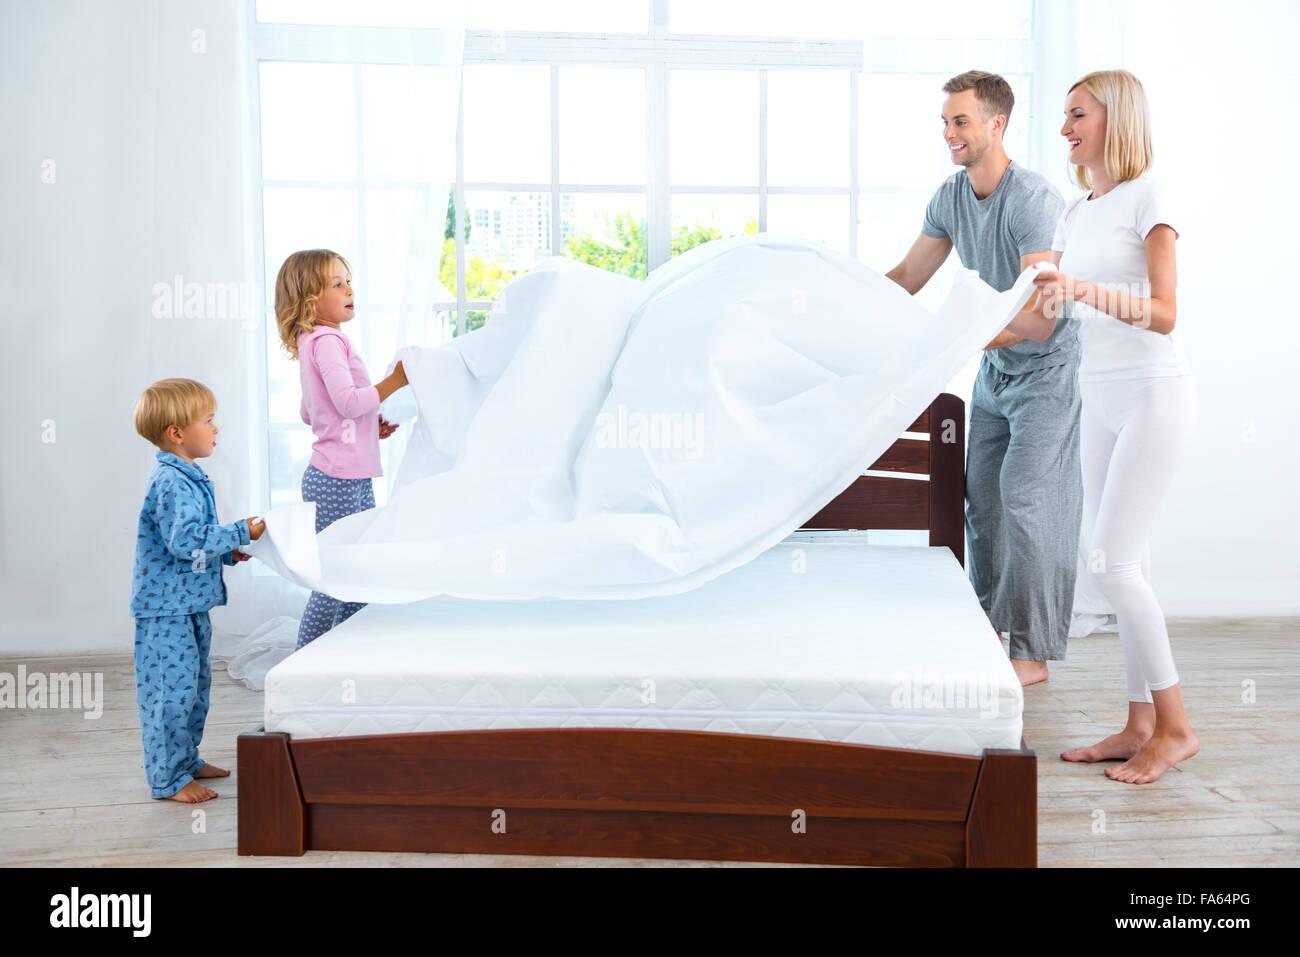 Jeune famille à Nice Chambres Photo Stock